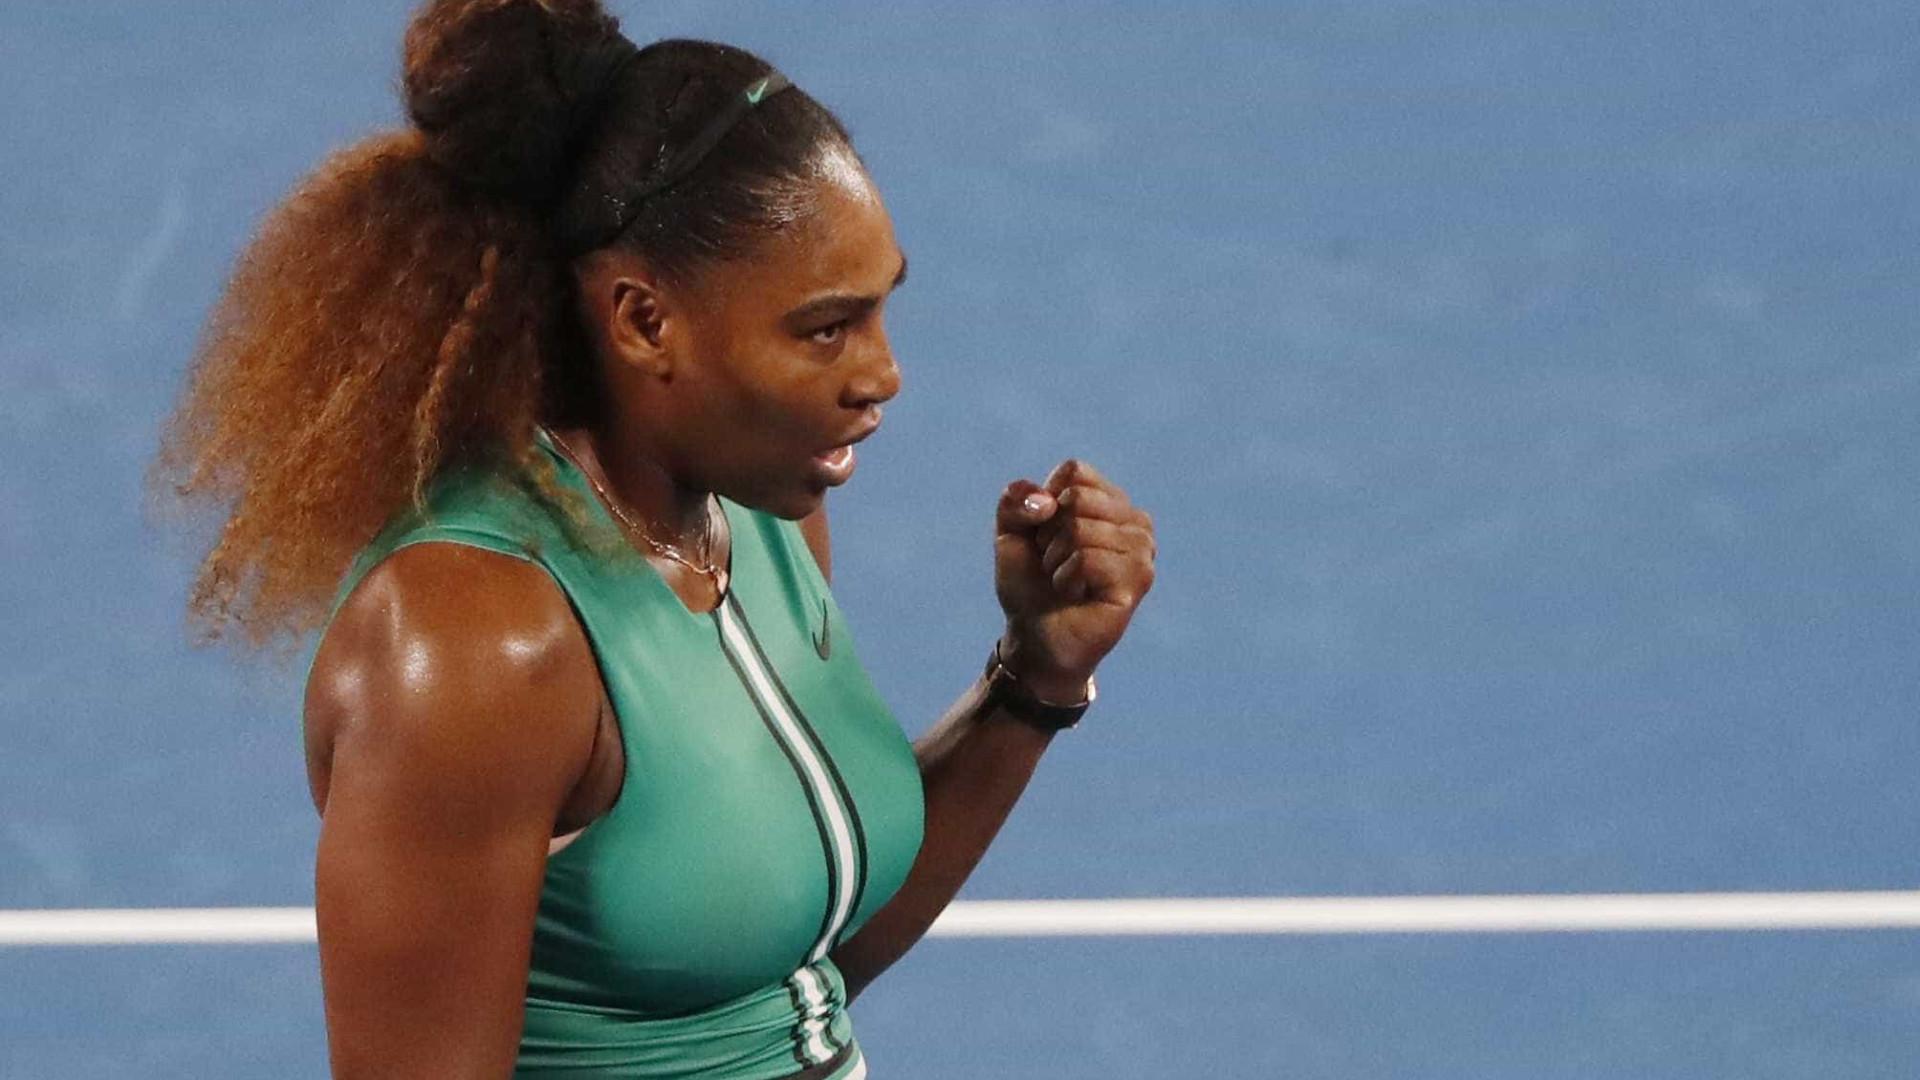 Serena vence e garante vaga na 3ª rodada do Aberto da Austrália